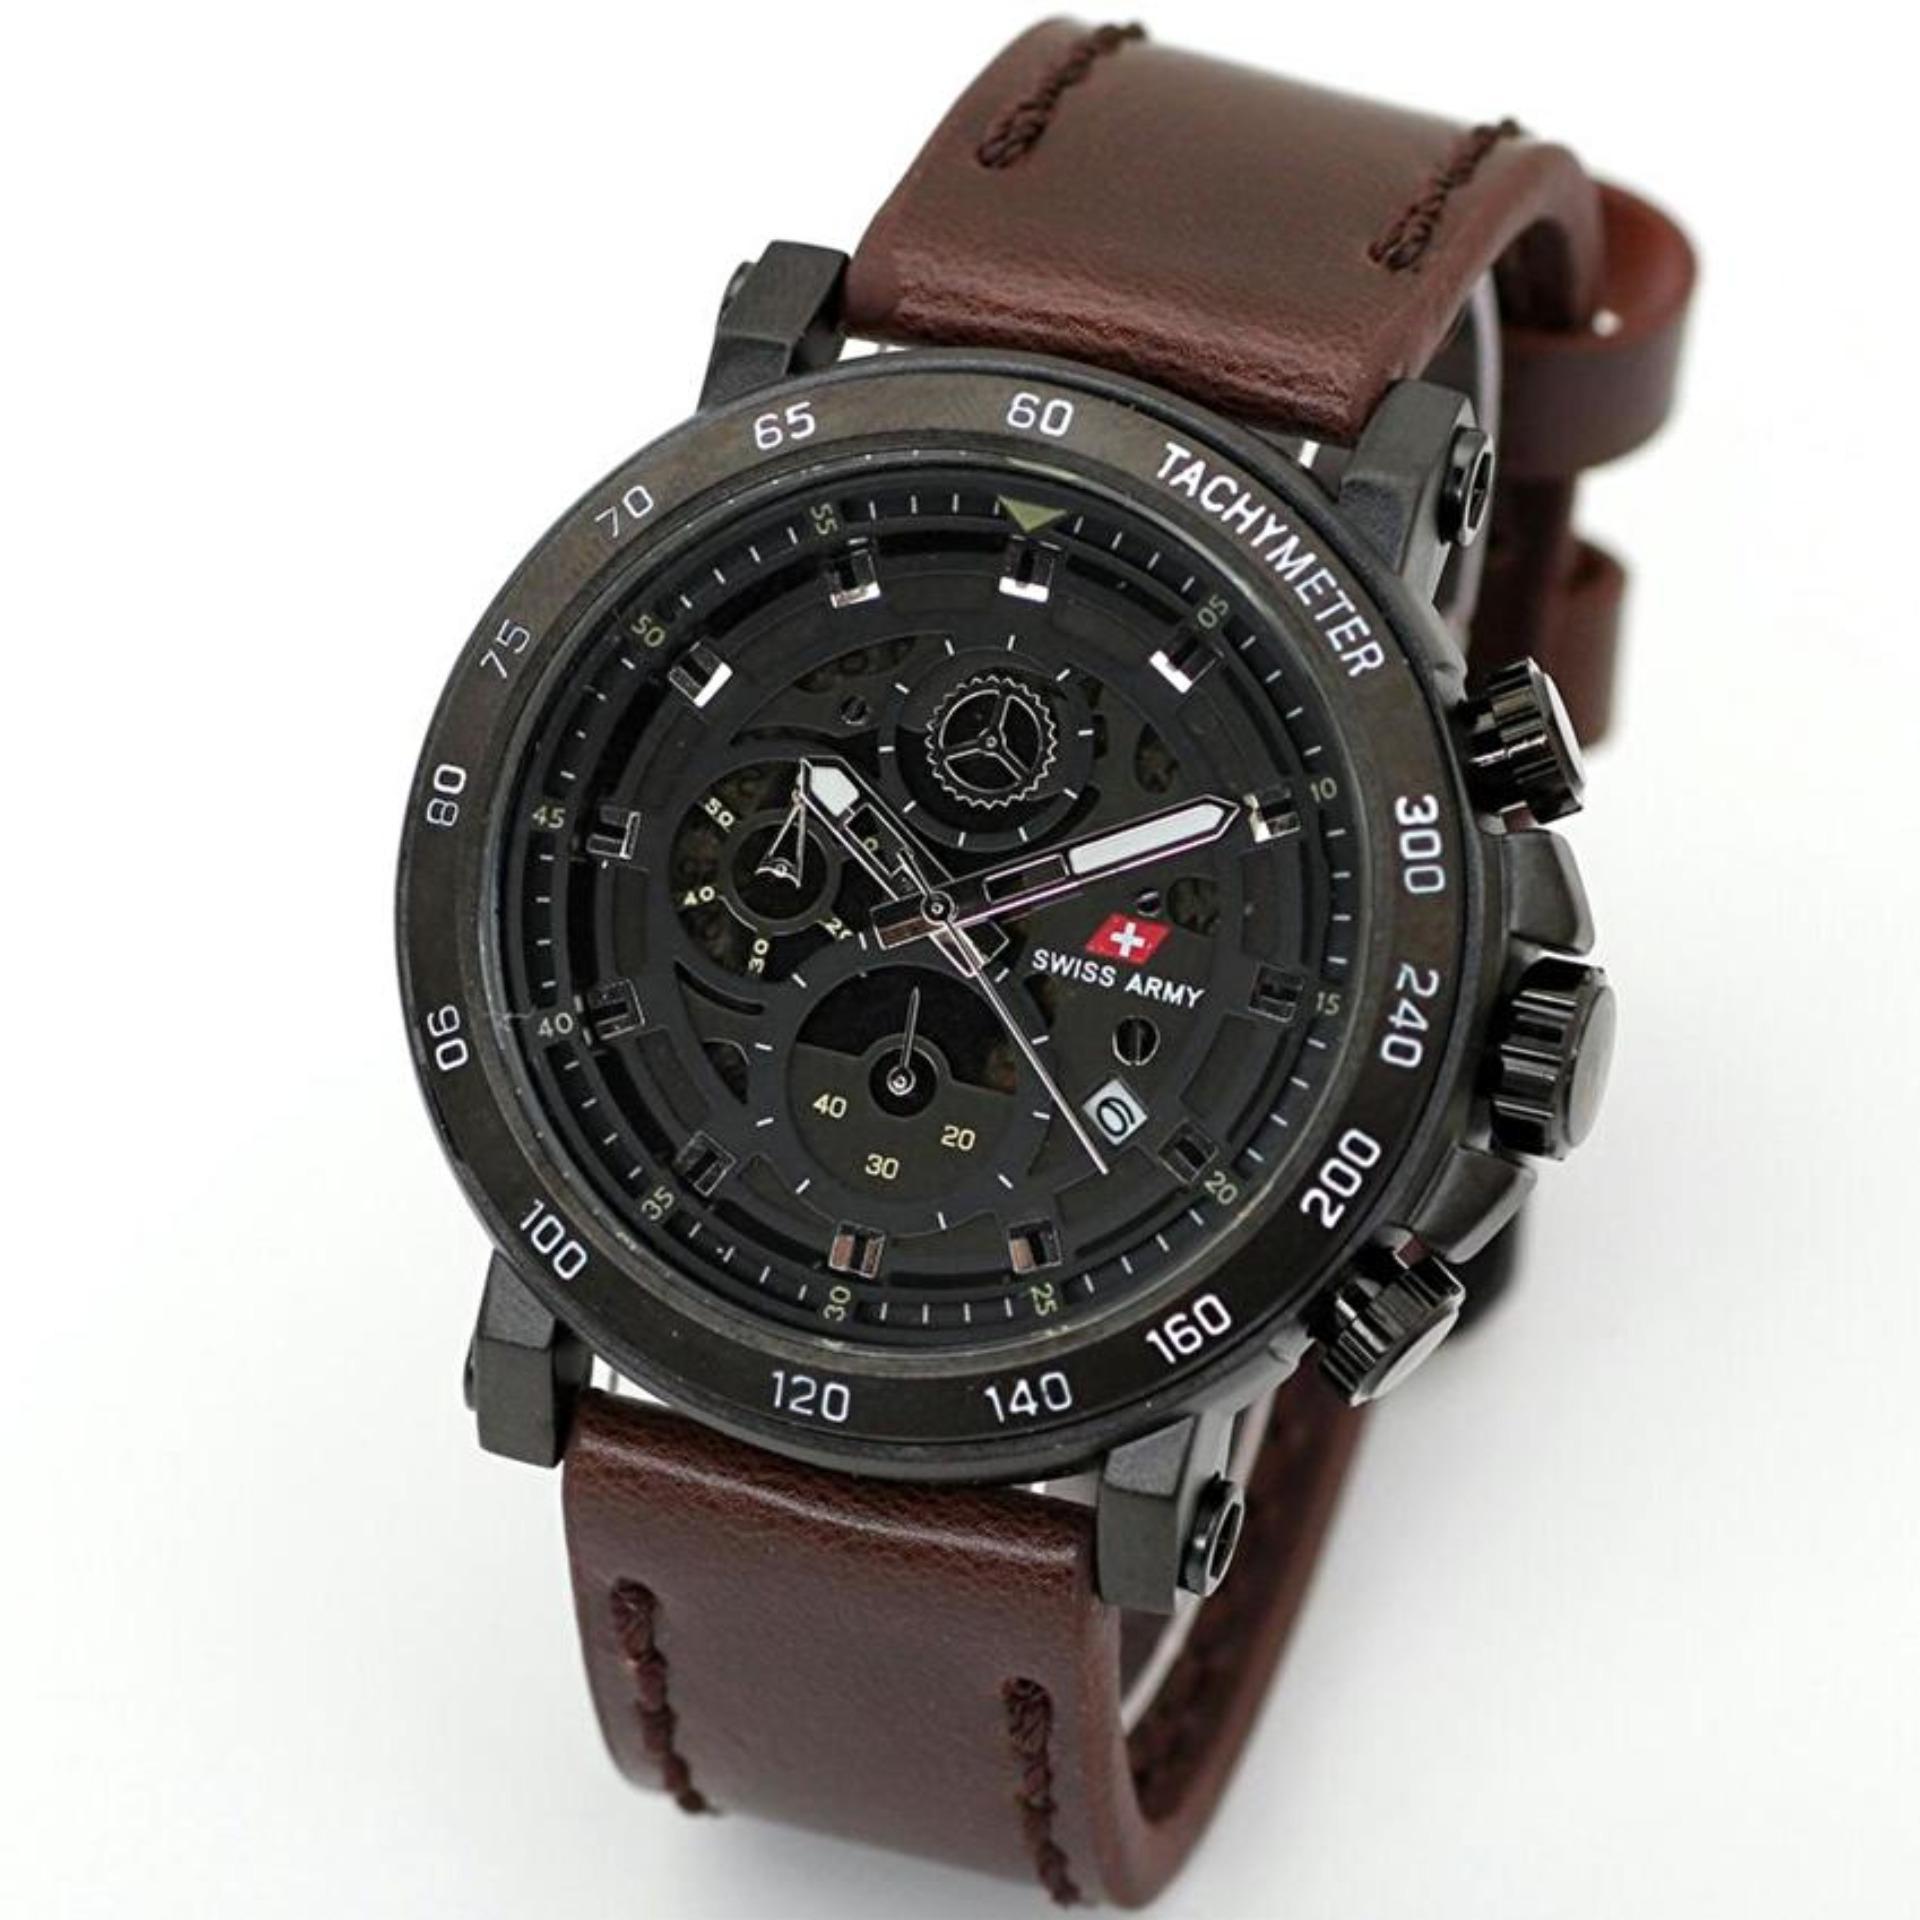 Swiss Army - Jam Tangan Pria - Leather Strap - SA 1115 CRONO .